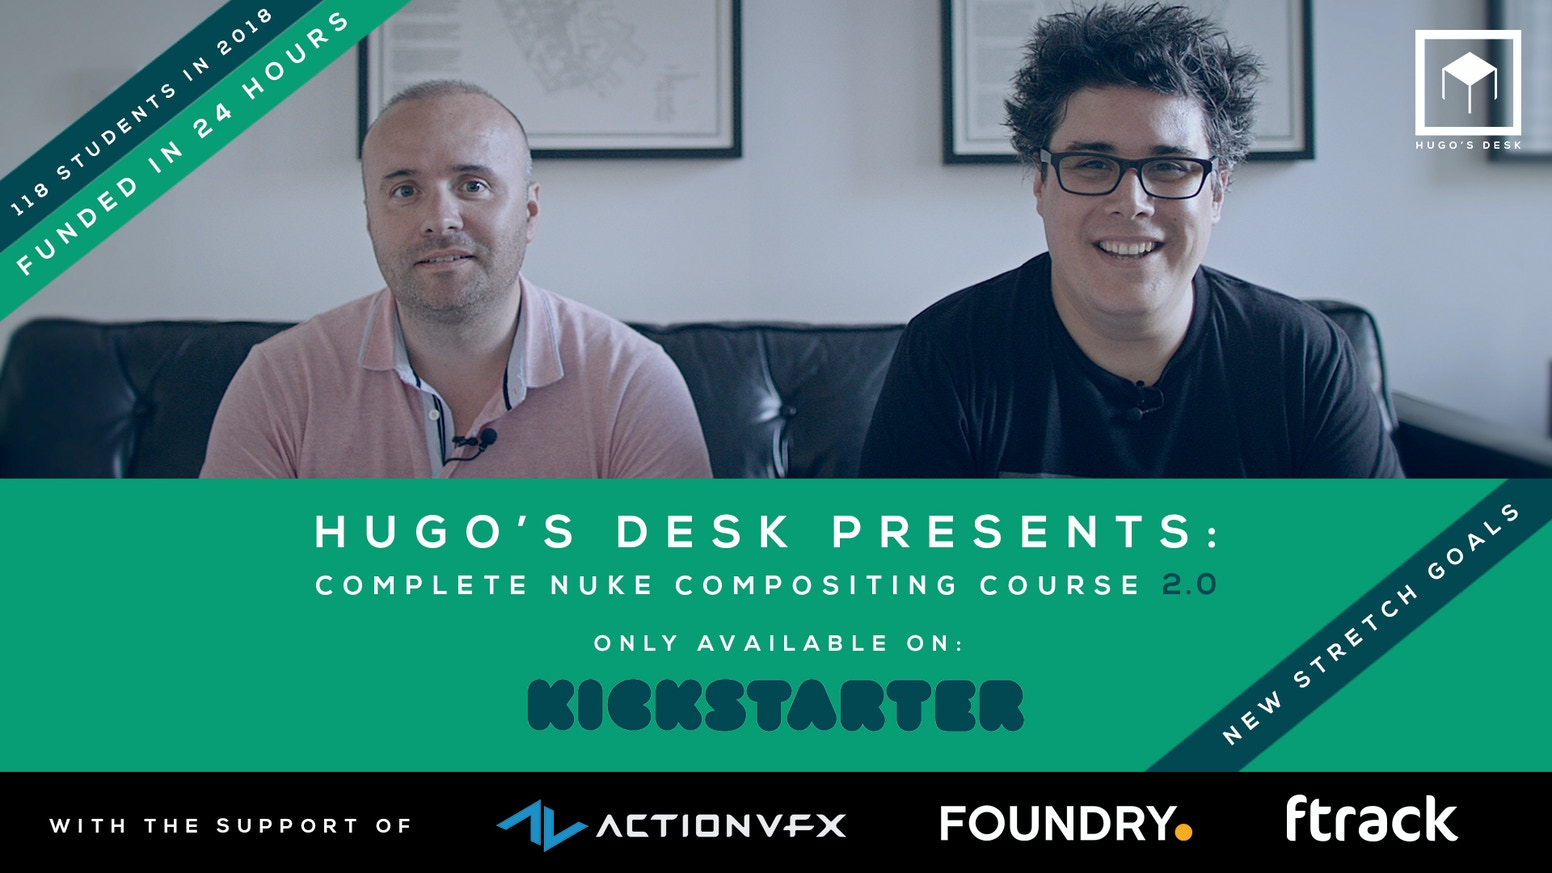 Hugo's Desk Presents: Complete Nuke Compositing course 2 0